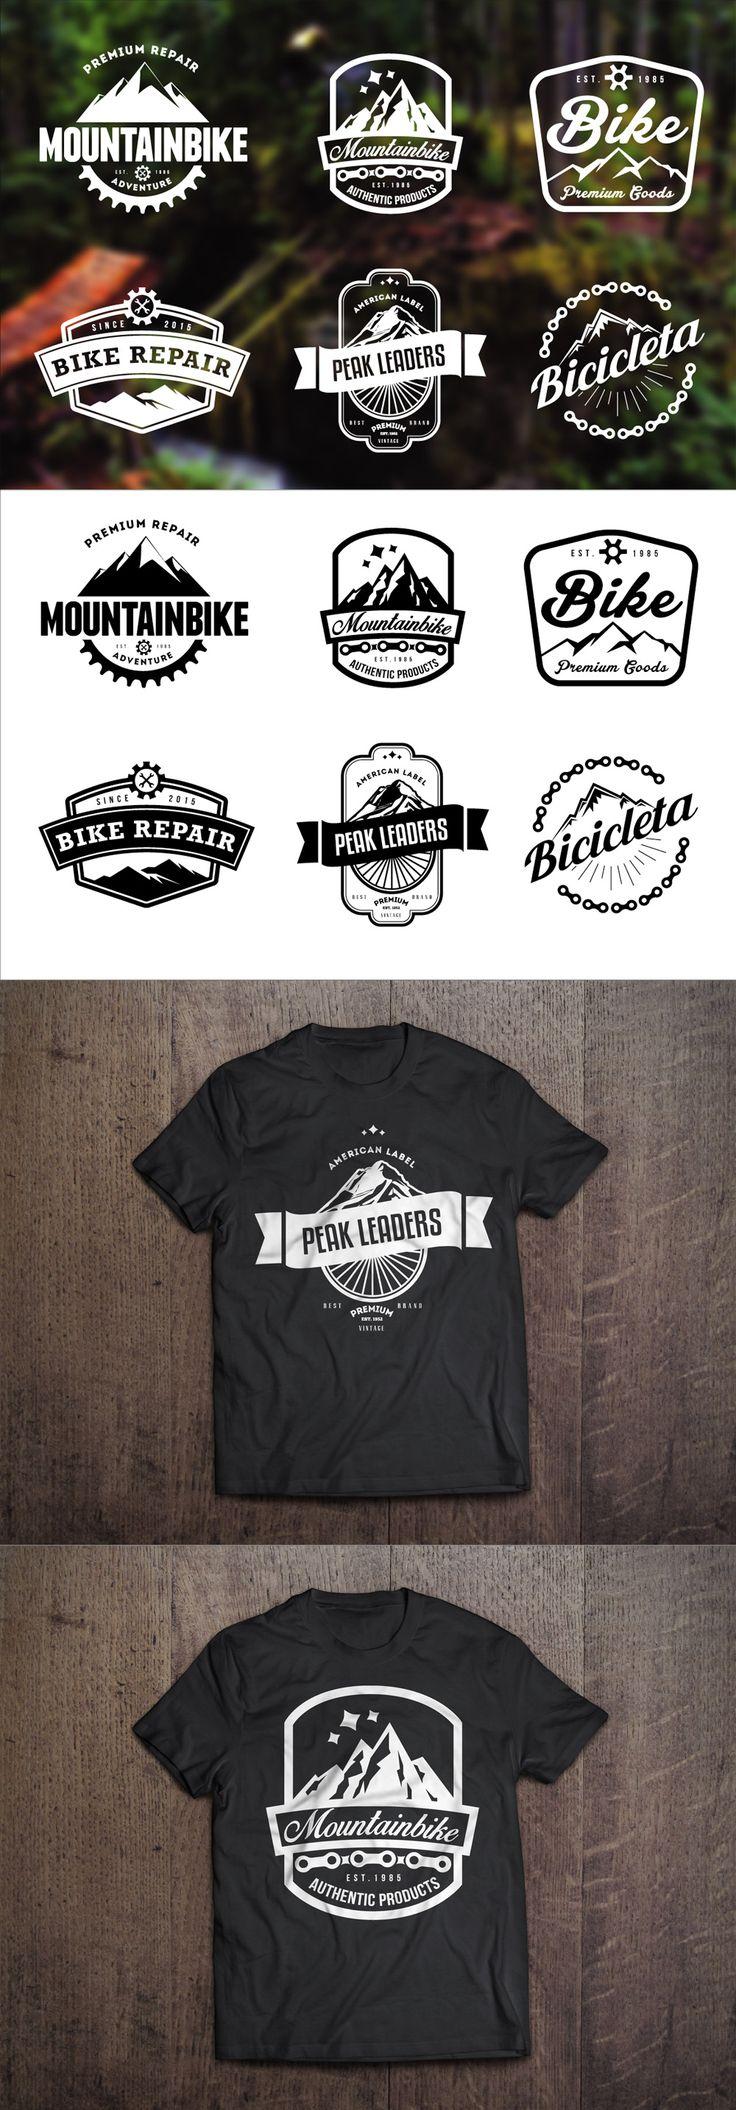 Mountain Bike Retro Badges Template #design Download: https://creativemarket.com/lovepower/85908-Mountain-Bike-Retro-Badges?u=ksioks